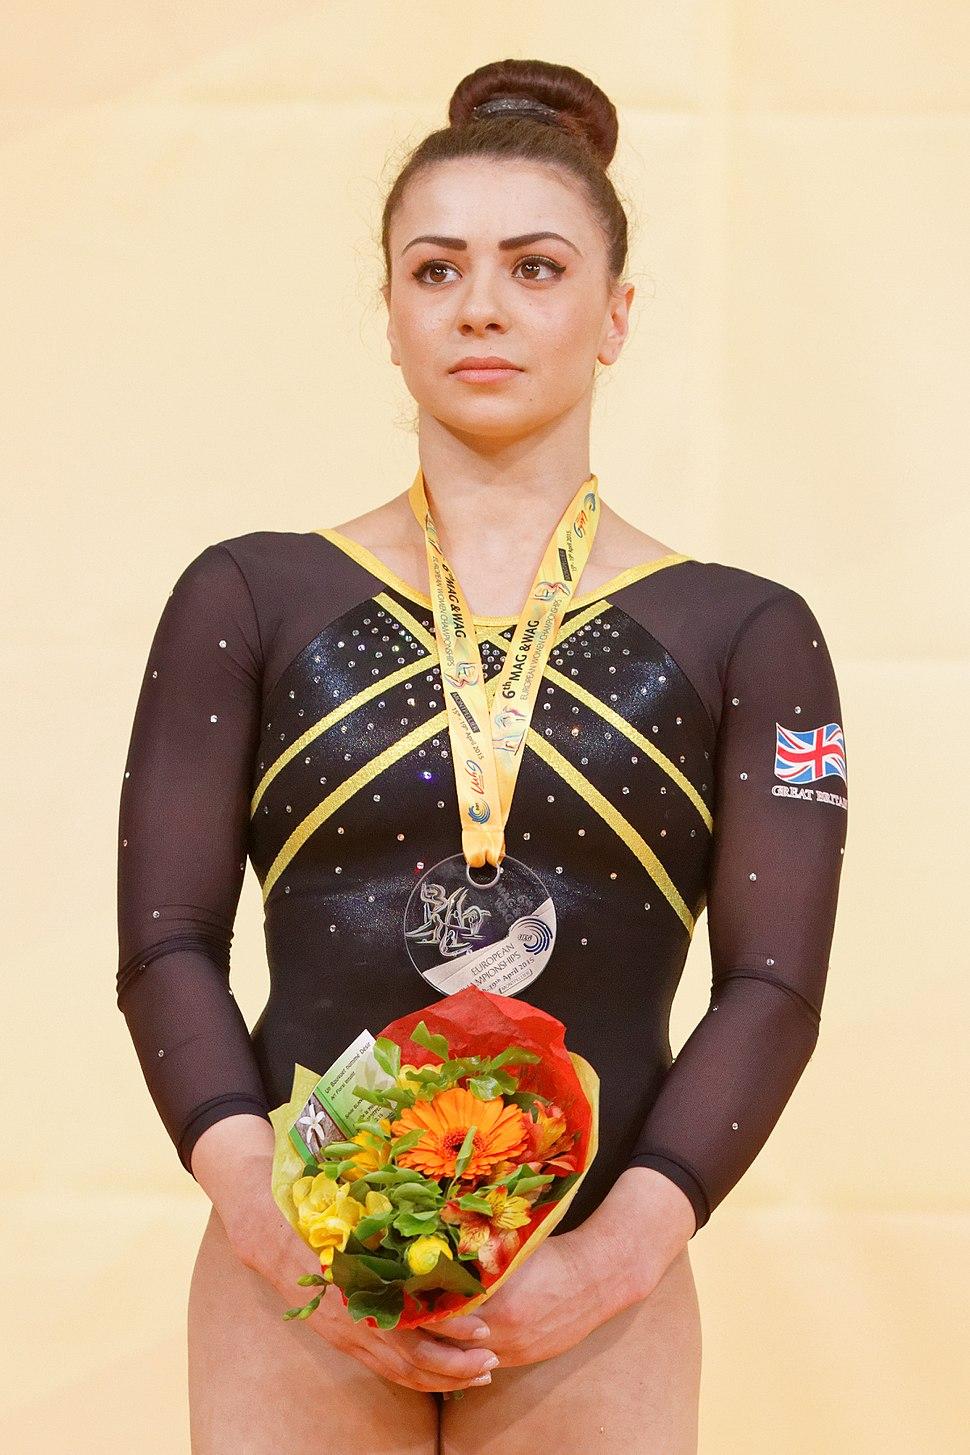 2015 European Artistic Gymnastics Championships - Floor - Medalists 09